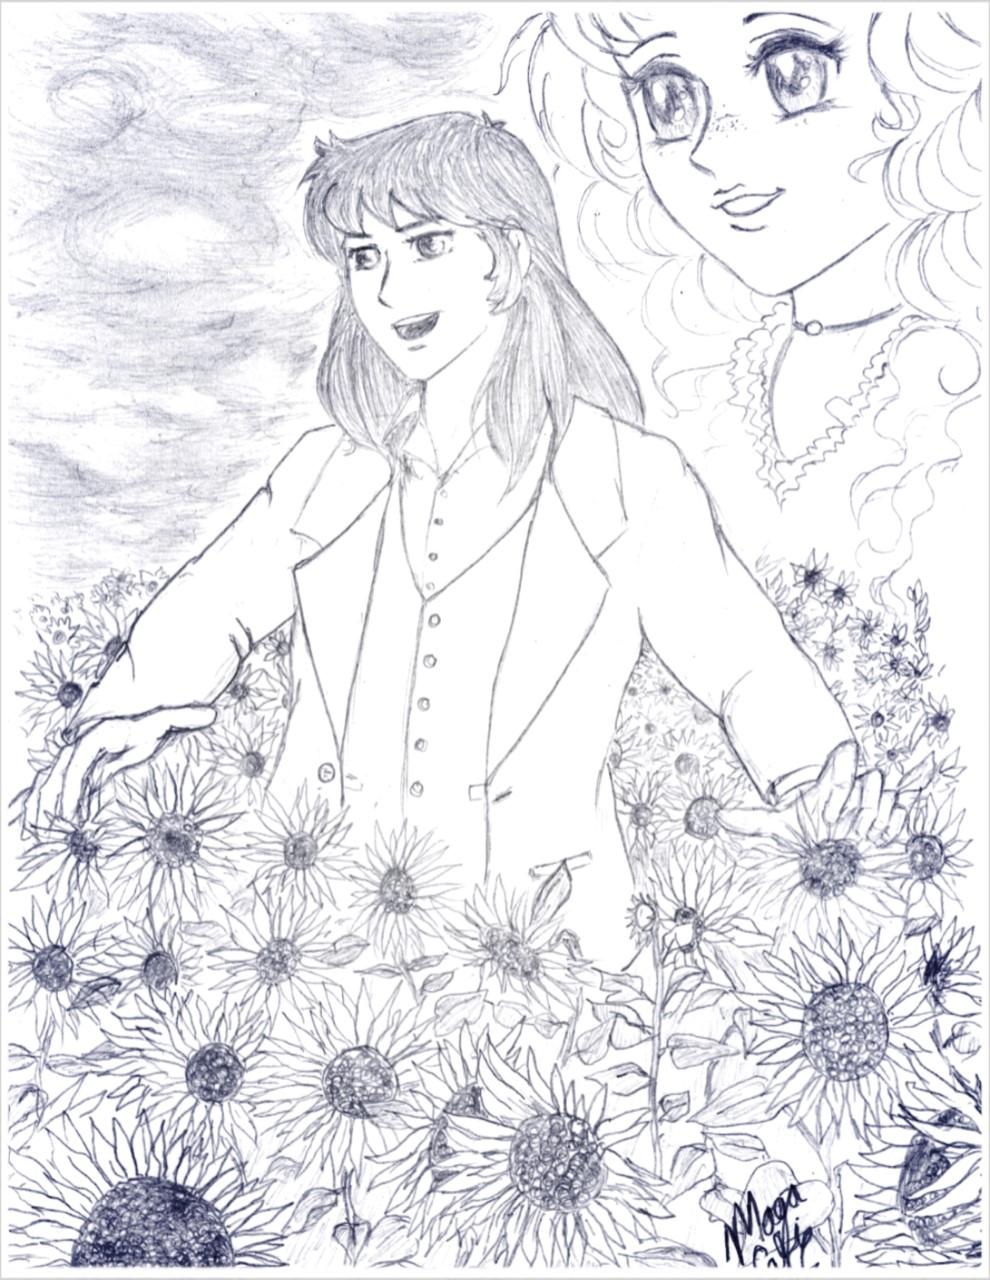 Fanart: Sunflower, dibujó a lápiz  Sunter10